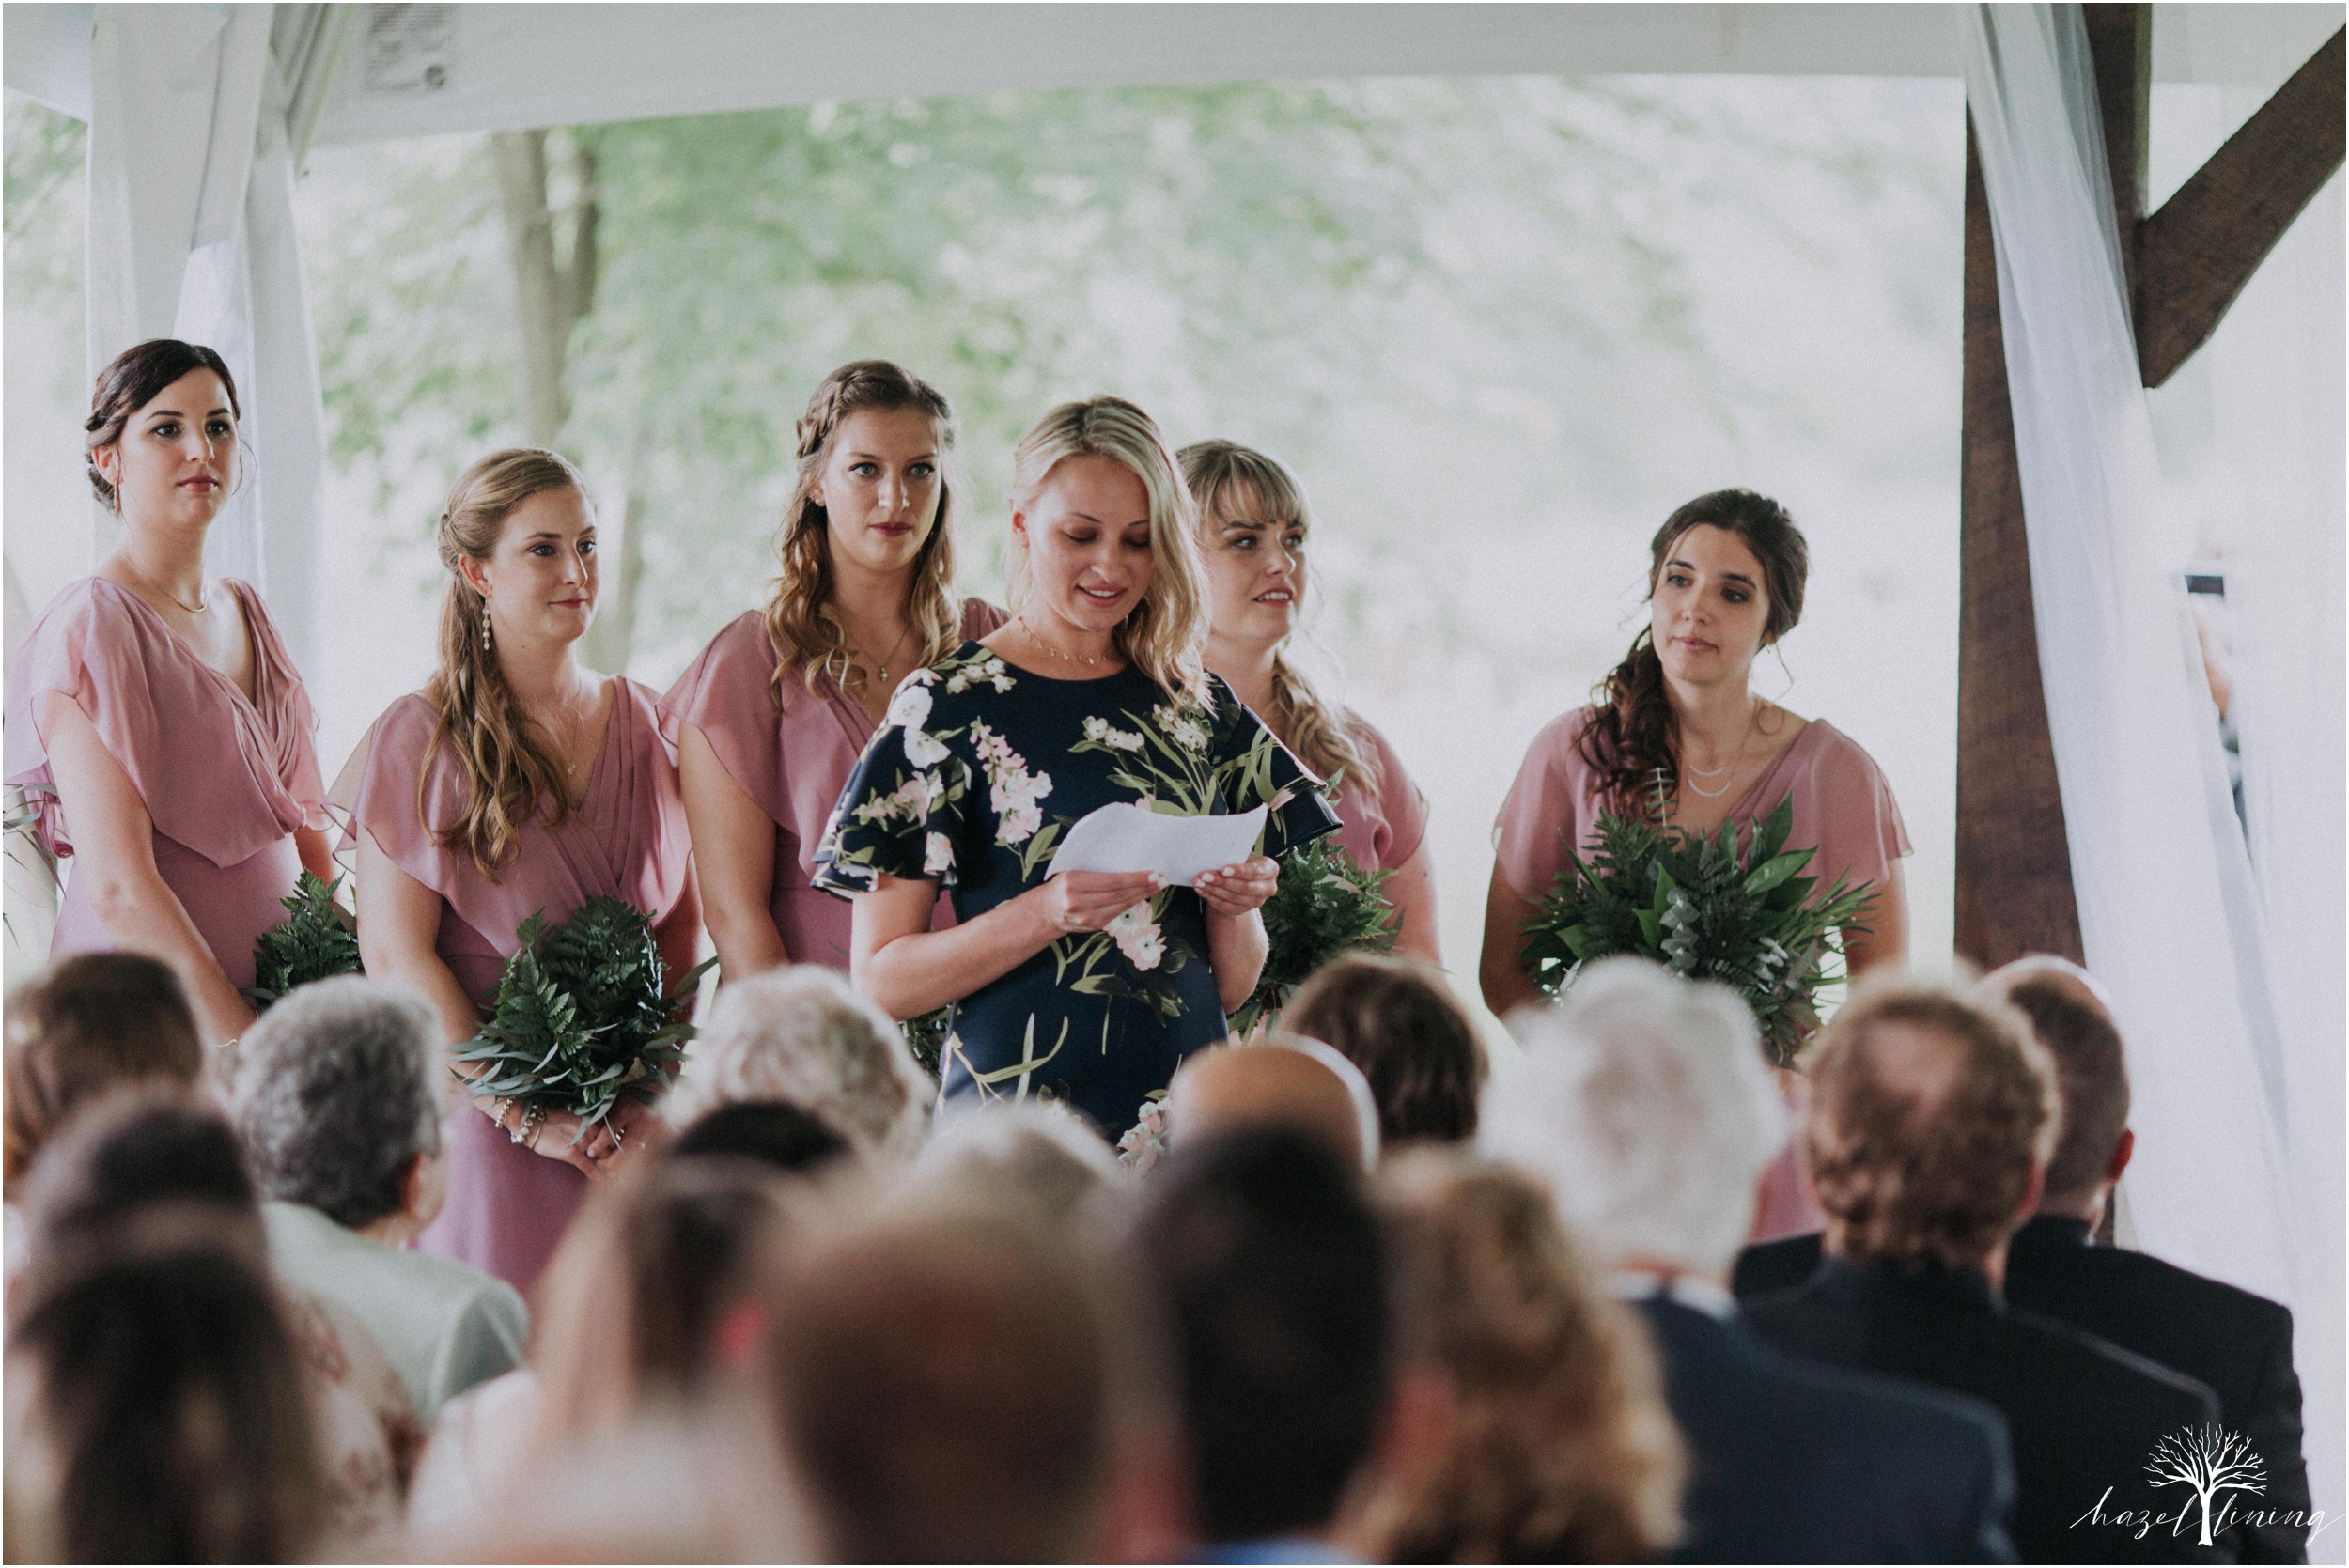 hazel-lining-travel-wedding-elopement-photography-lisa-landon-shoemaker-the-farm-bakery-and-events-bucks-county-quakertown-pennsylvania-summer-country-outdoor-farm-wedding_0056.jpg